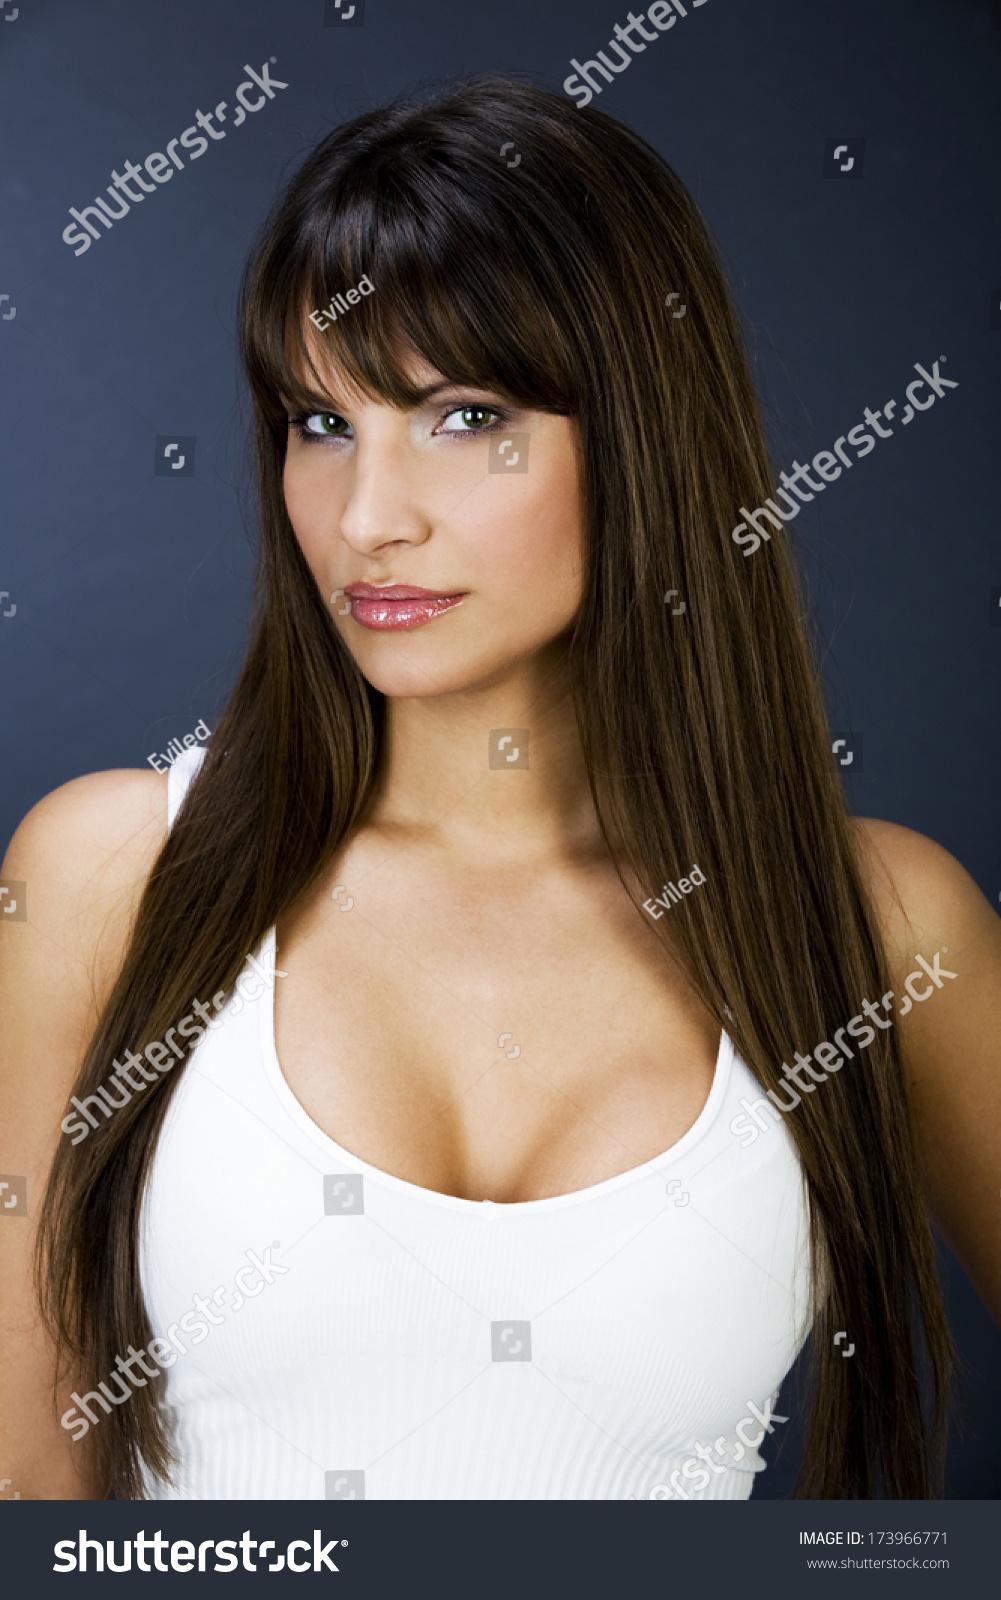 portrait beautiful women big boobs stock photo (edit now) 173966771